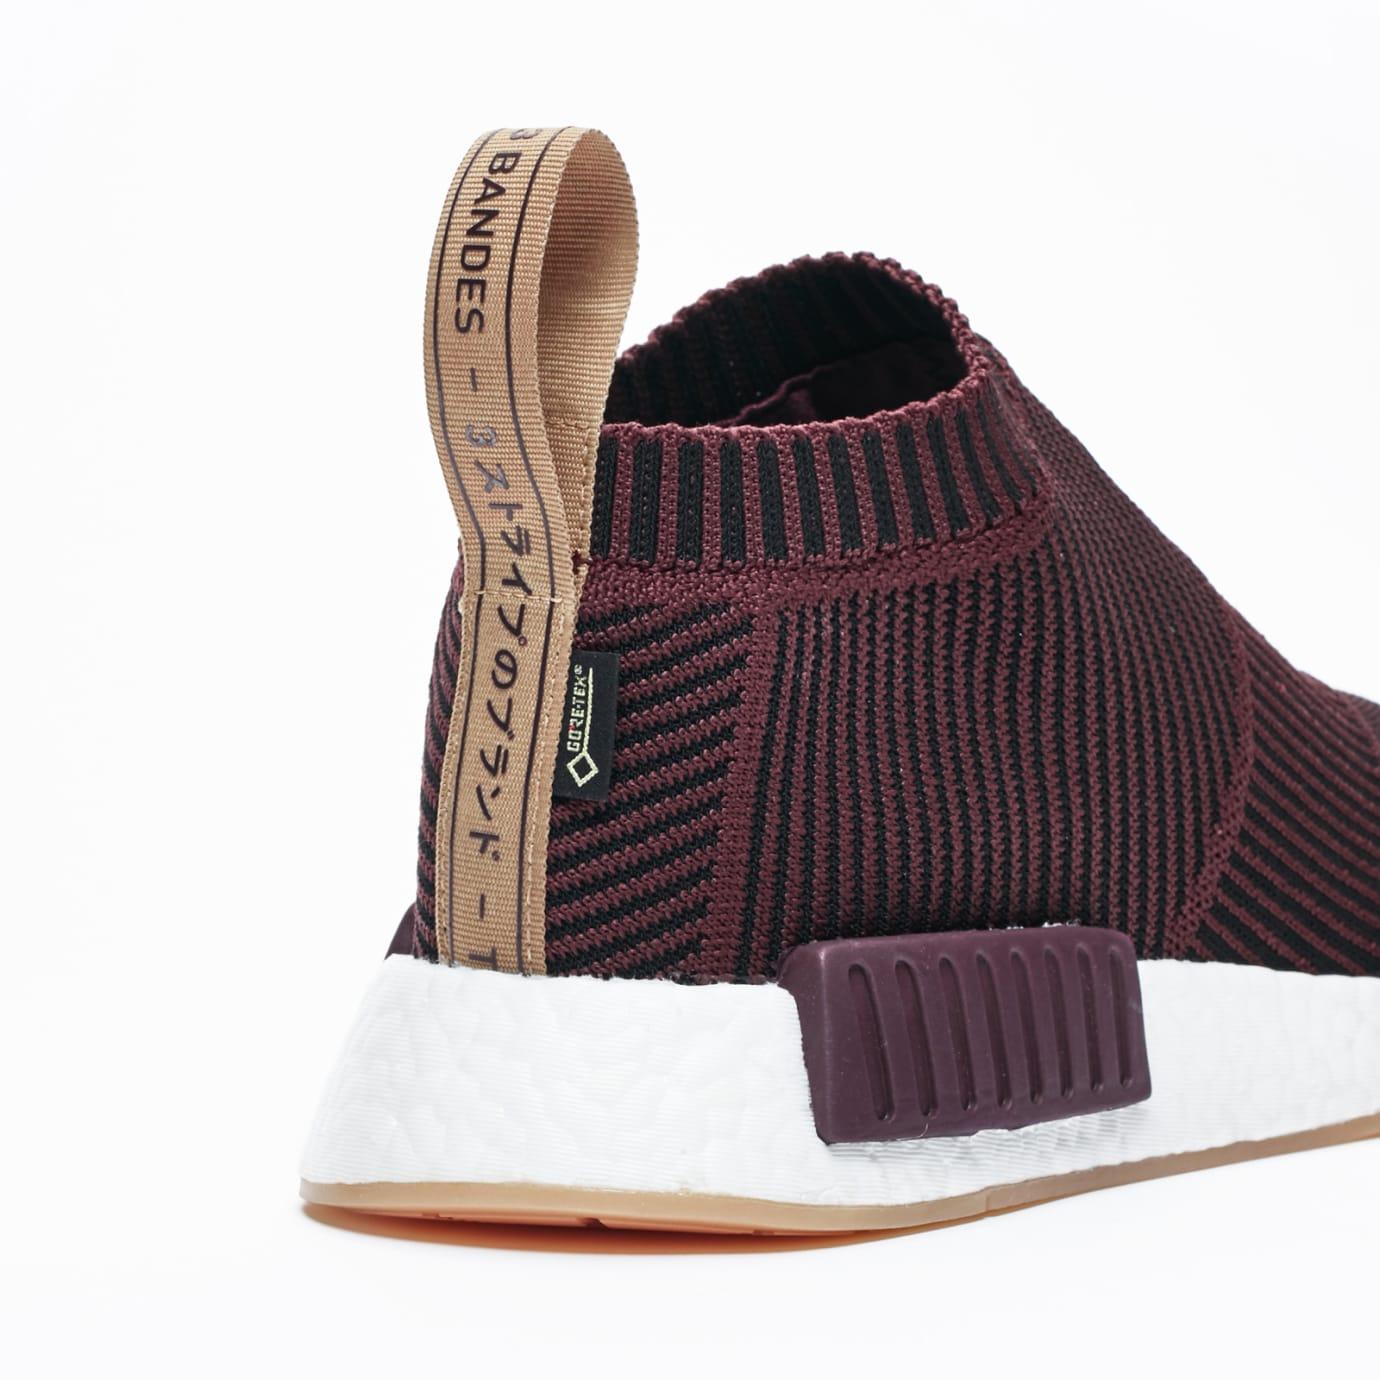 Adidas NMD_CS1 Gore-Tex Primeknit 'SNS Exclusive' AQ0364 (Heel)